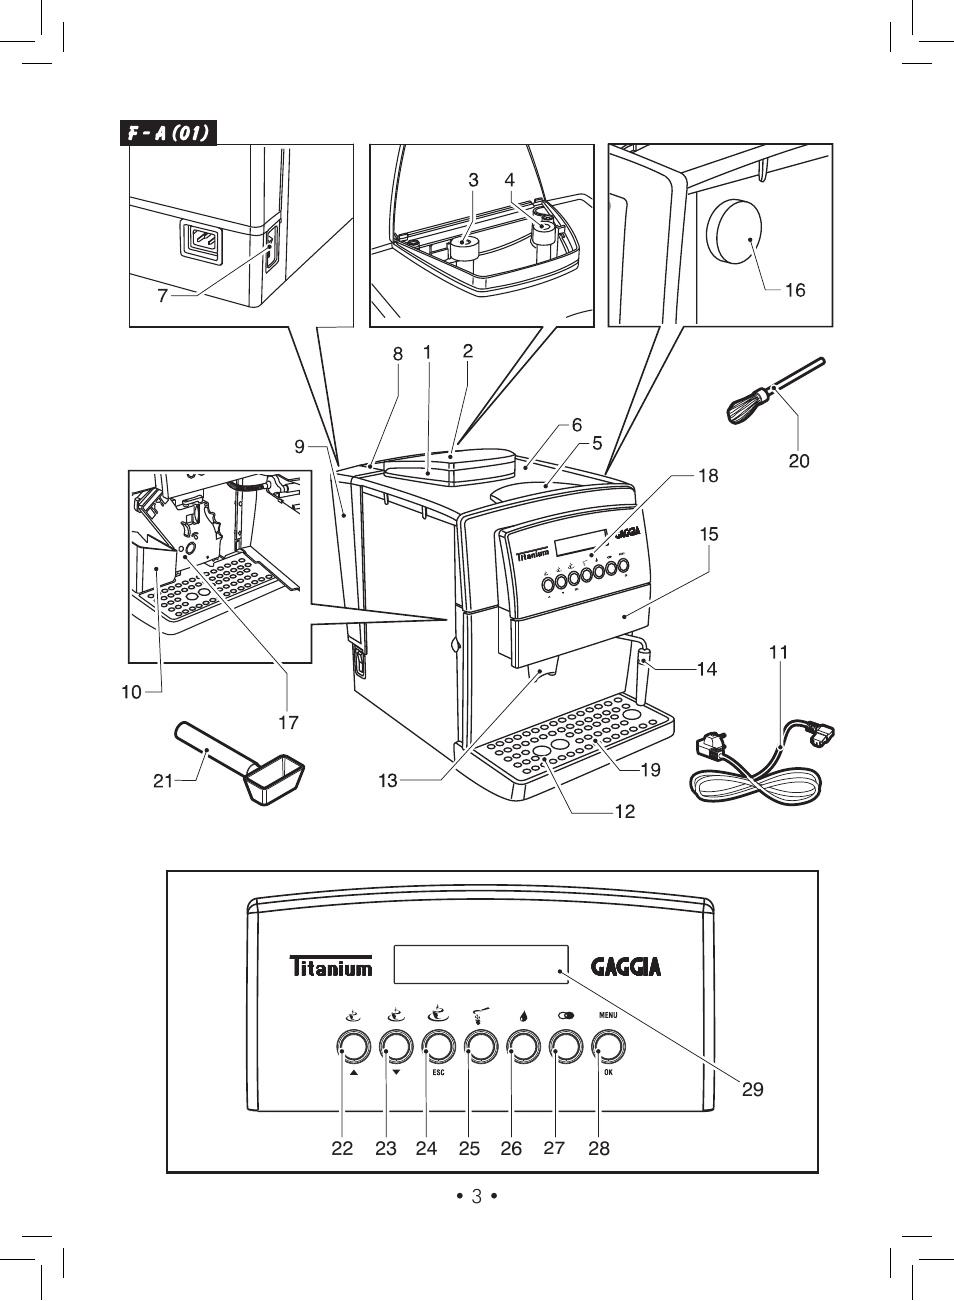 gaggia titanium user manual page 3 132 original mode rh manualsdir com gaggia titanium manual ventilate gaggia titanium user manual pdf